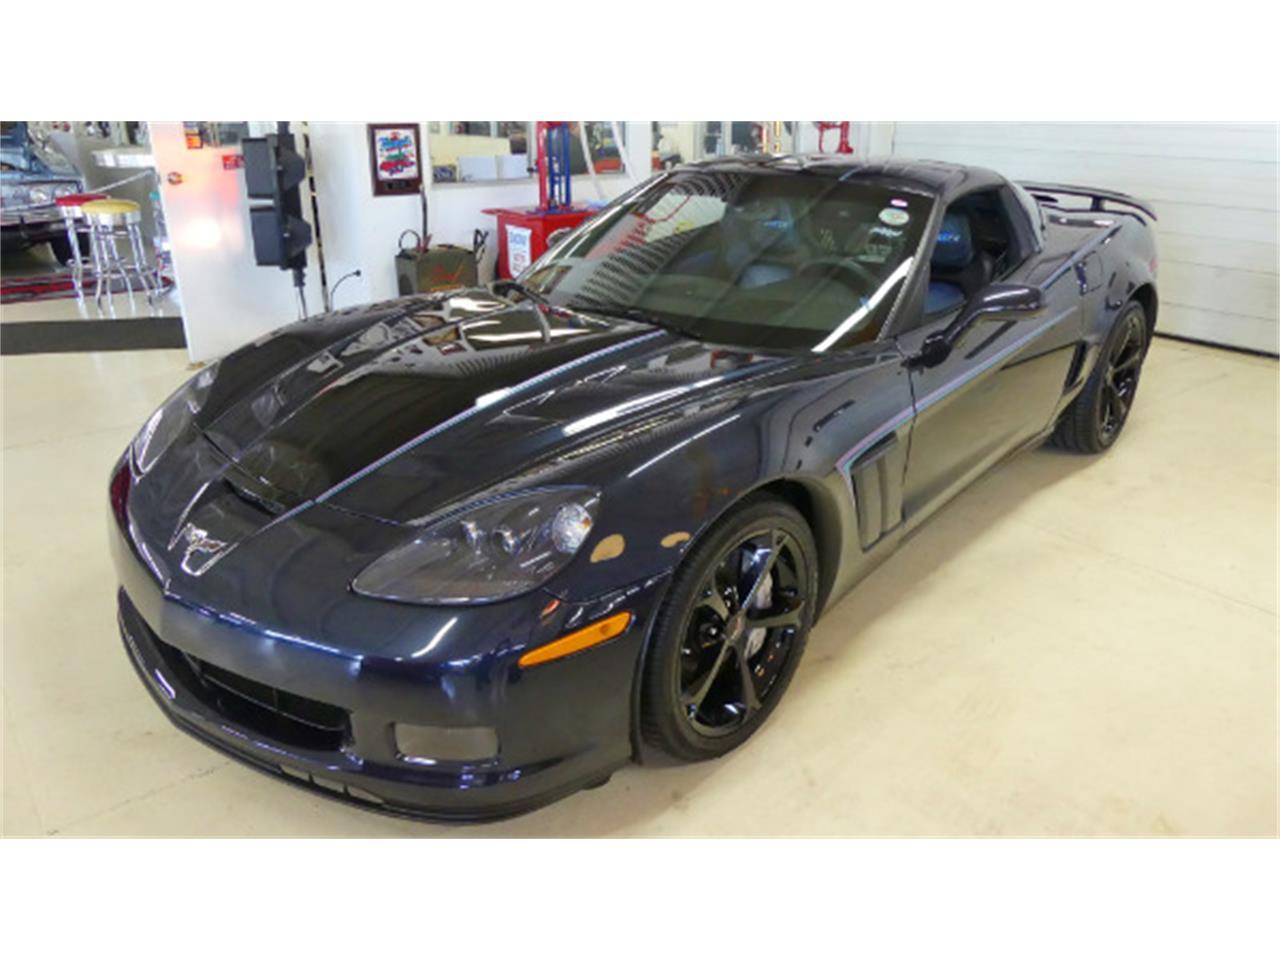 Large Picture of '13 Corvette located in Ohio - $45,895.00 Offered by Cruisin Classics - L3E0